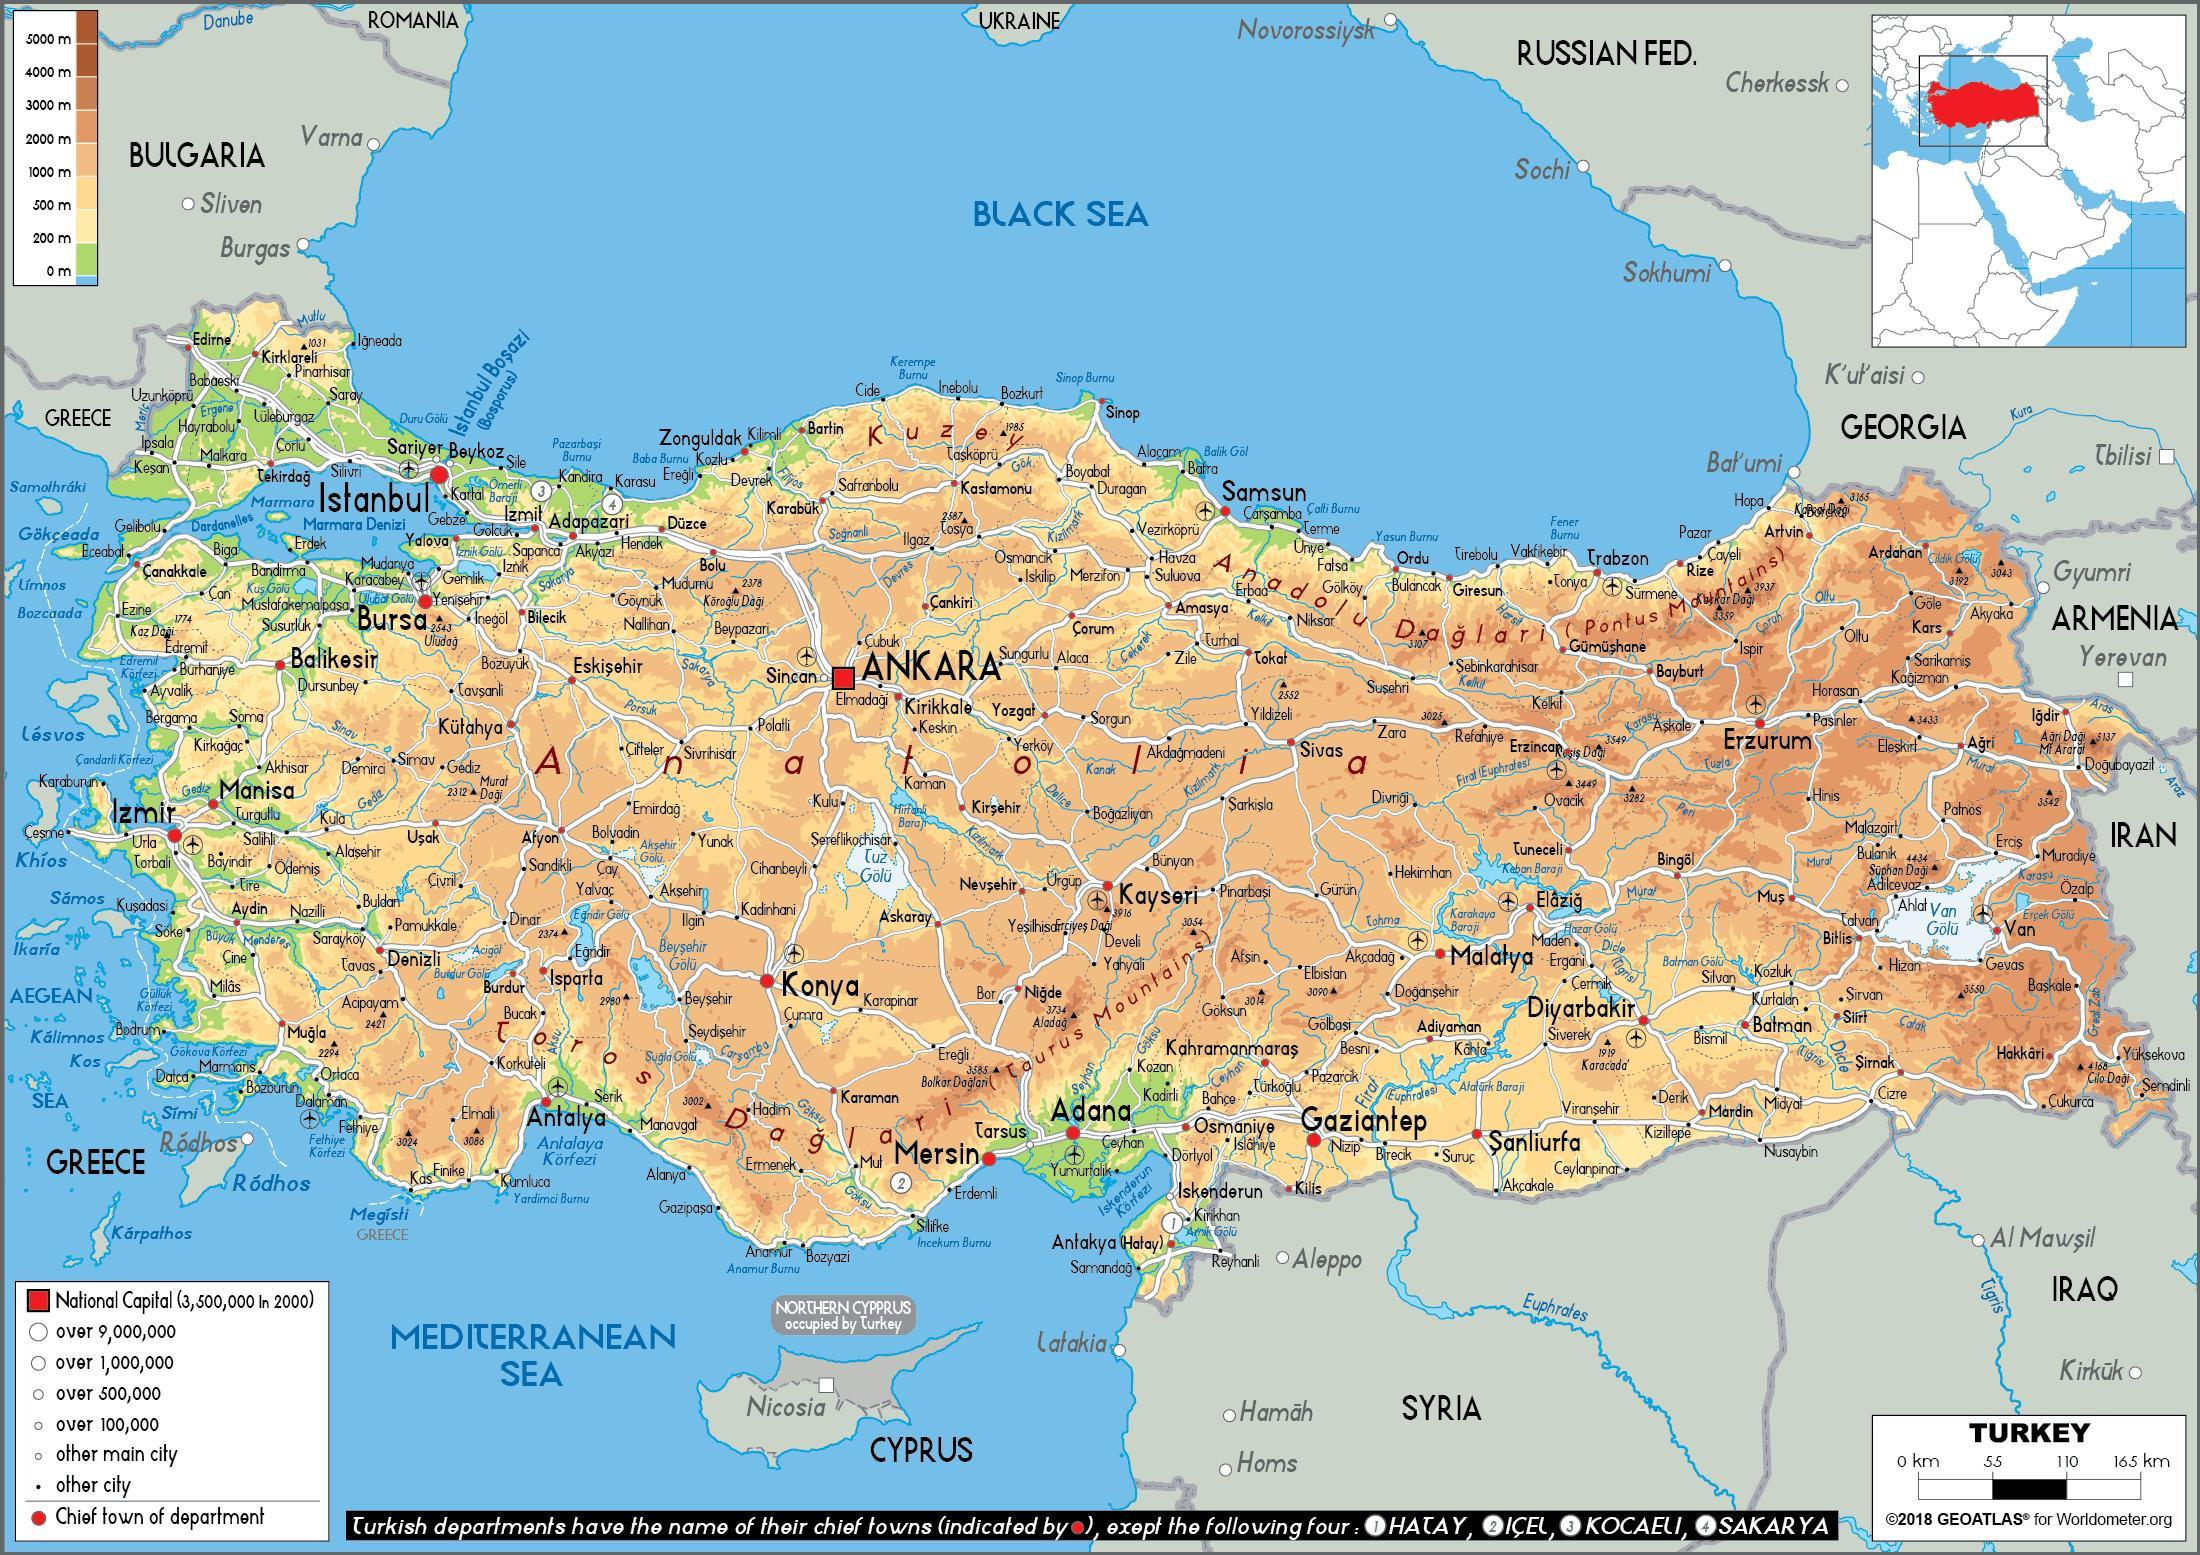 turska mapa Fizički mapu Turske   Mapa Turska fizički (Zapadna Azija   Aziji) turska mapa